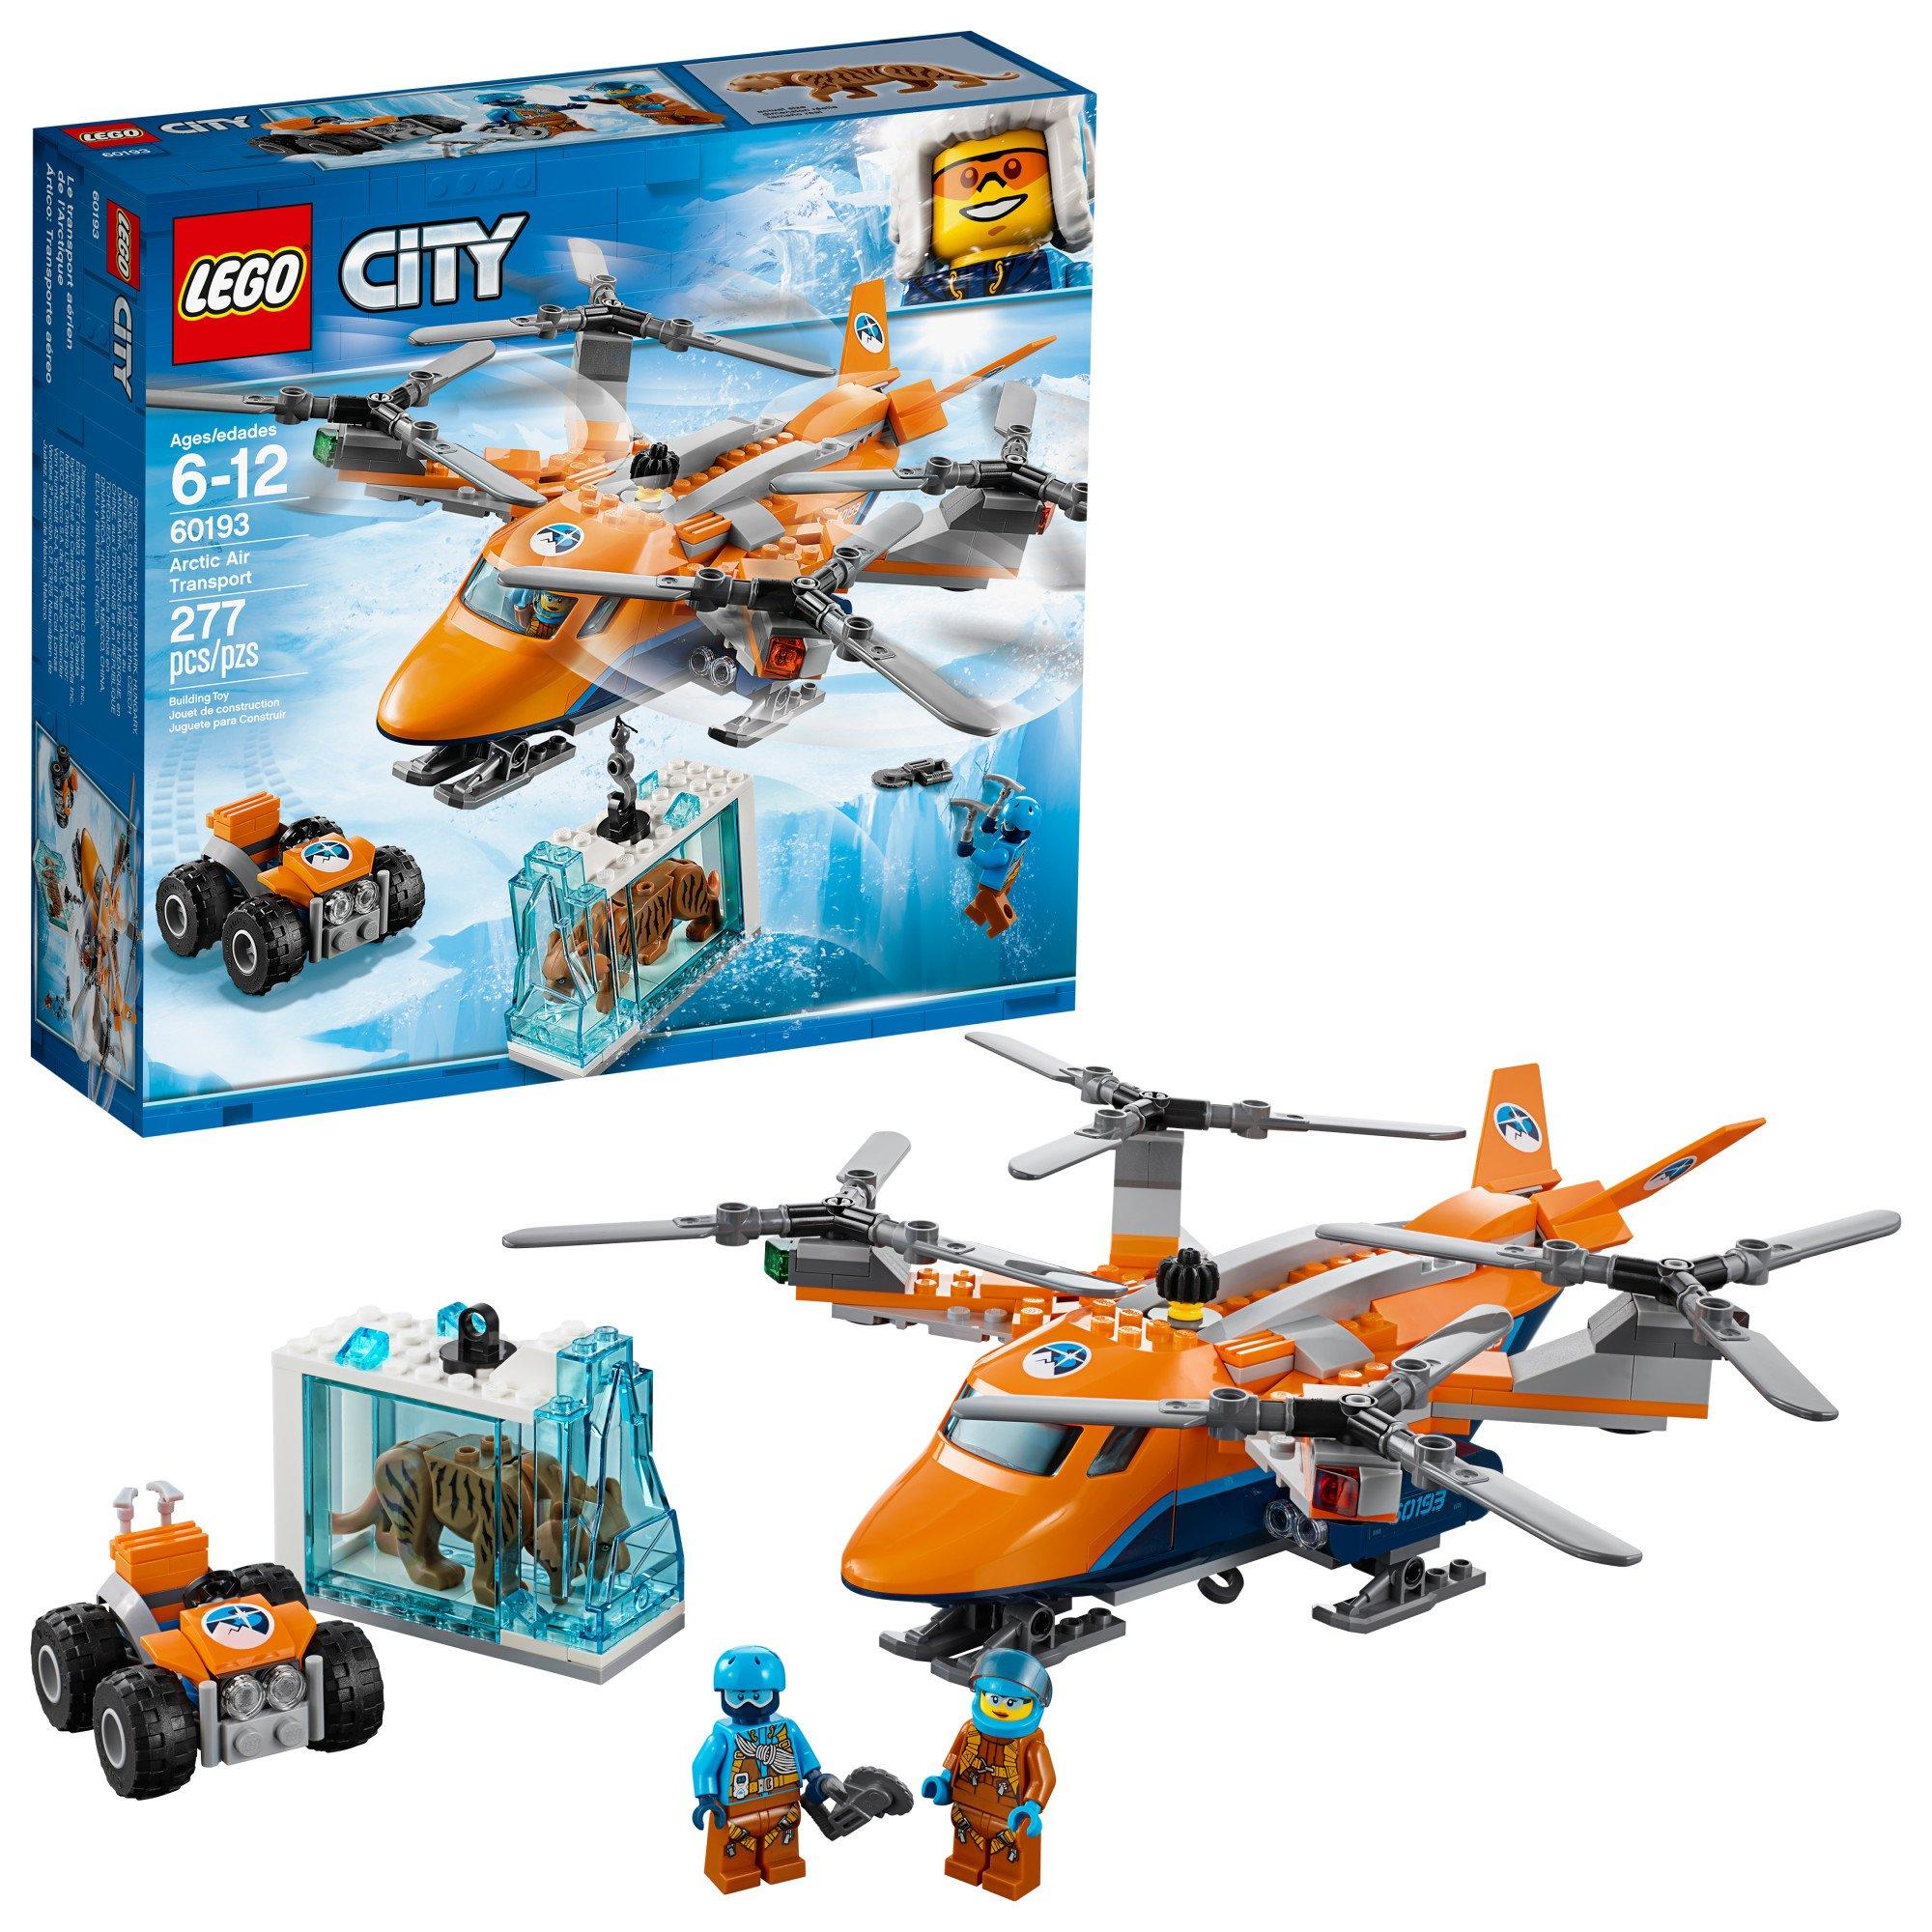 LEGO City Arctic Air Transport 60193 Building Kit (277 Piece)